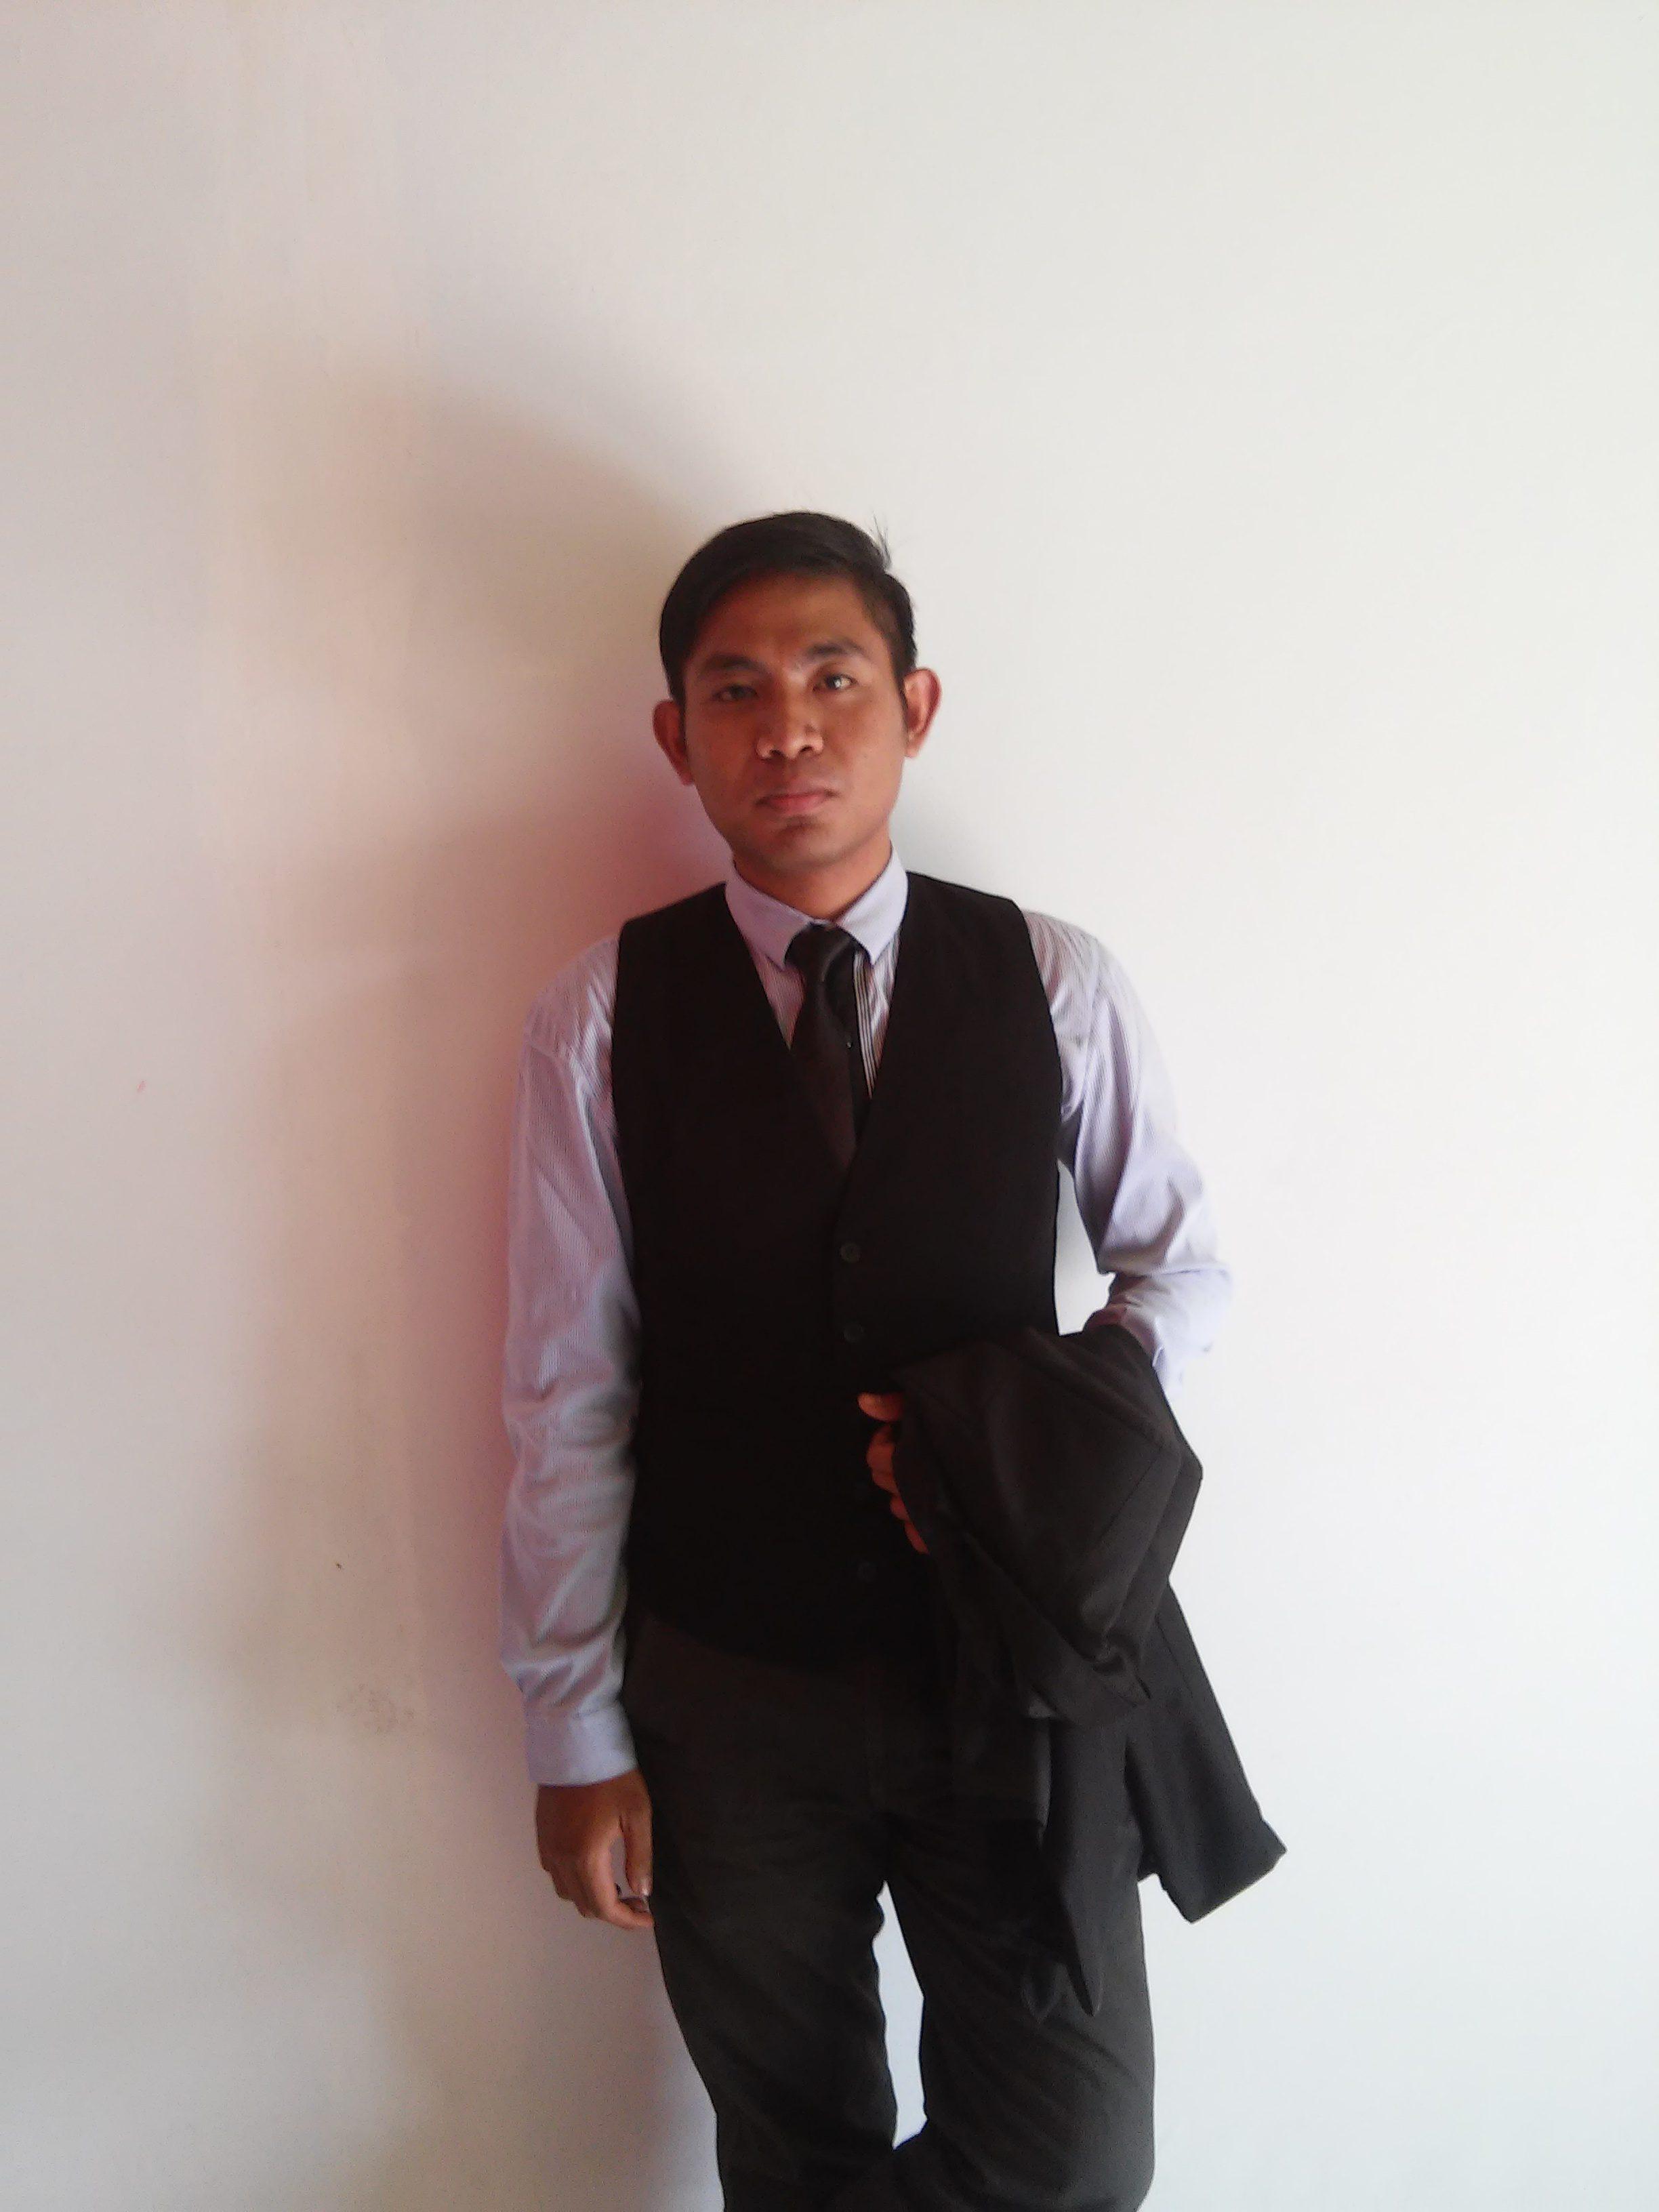 20140914_155202-e1483676770907.jpg